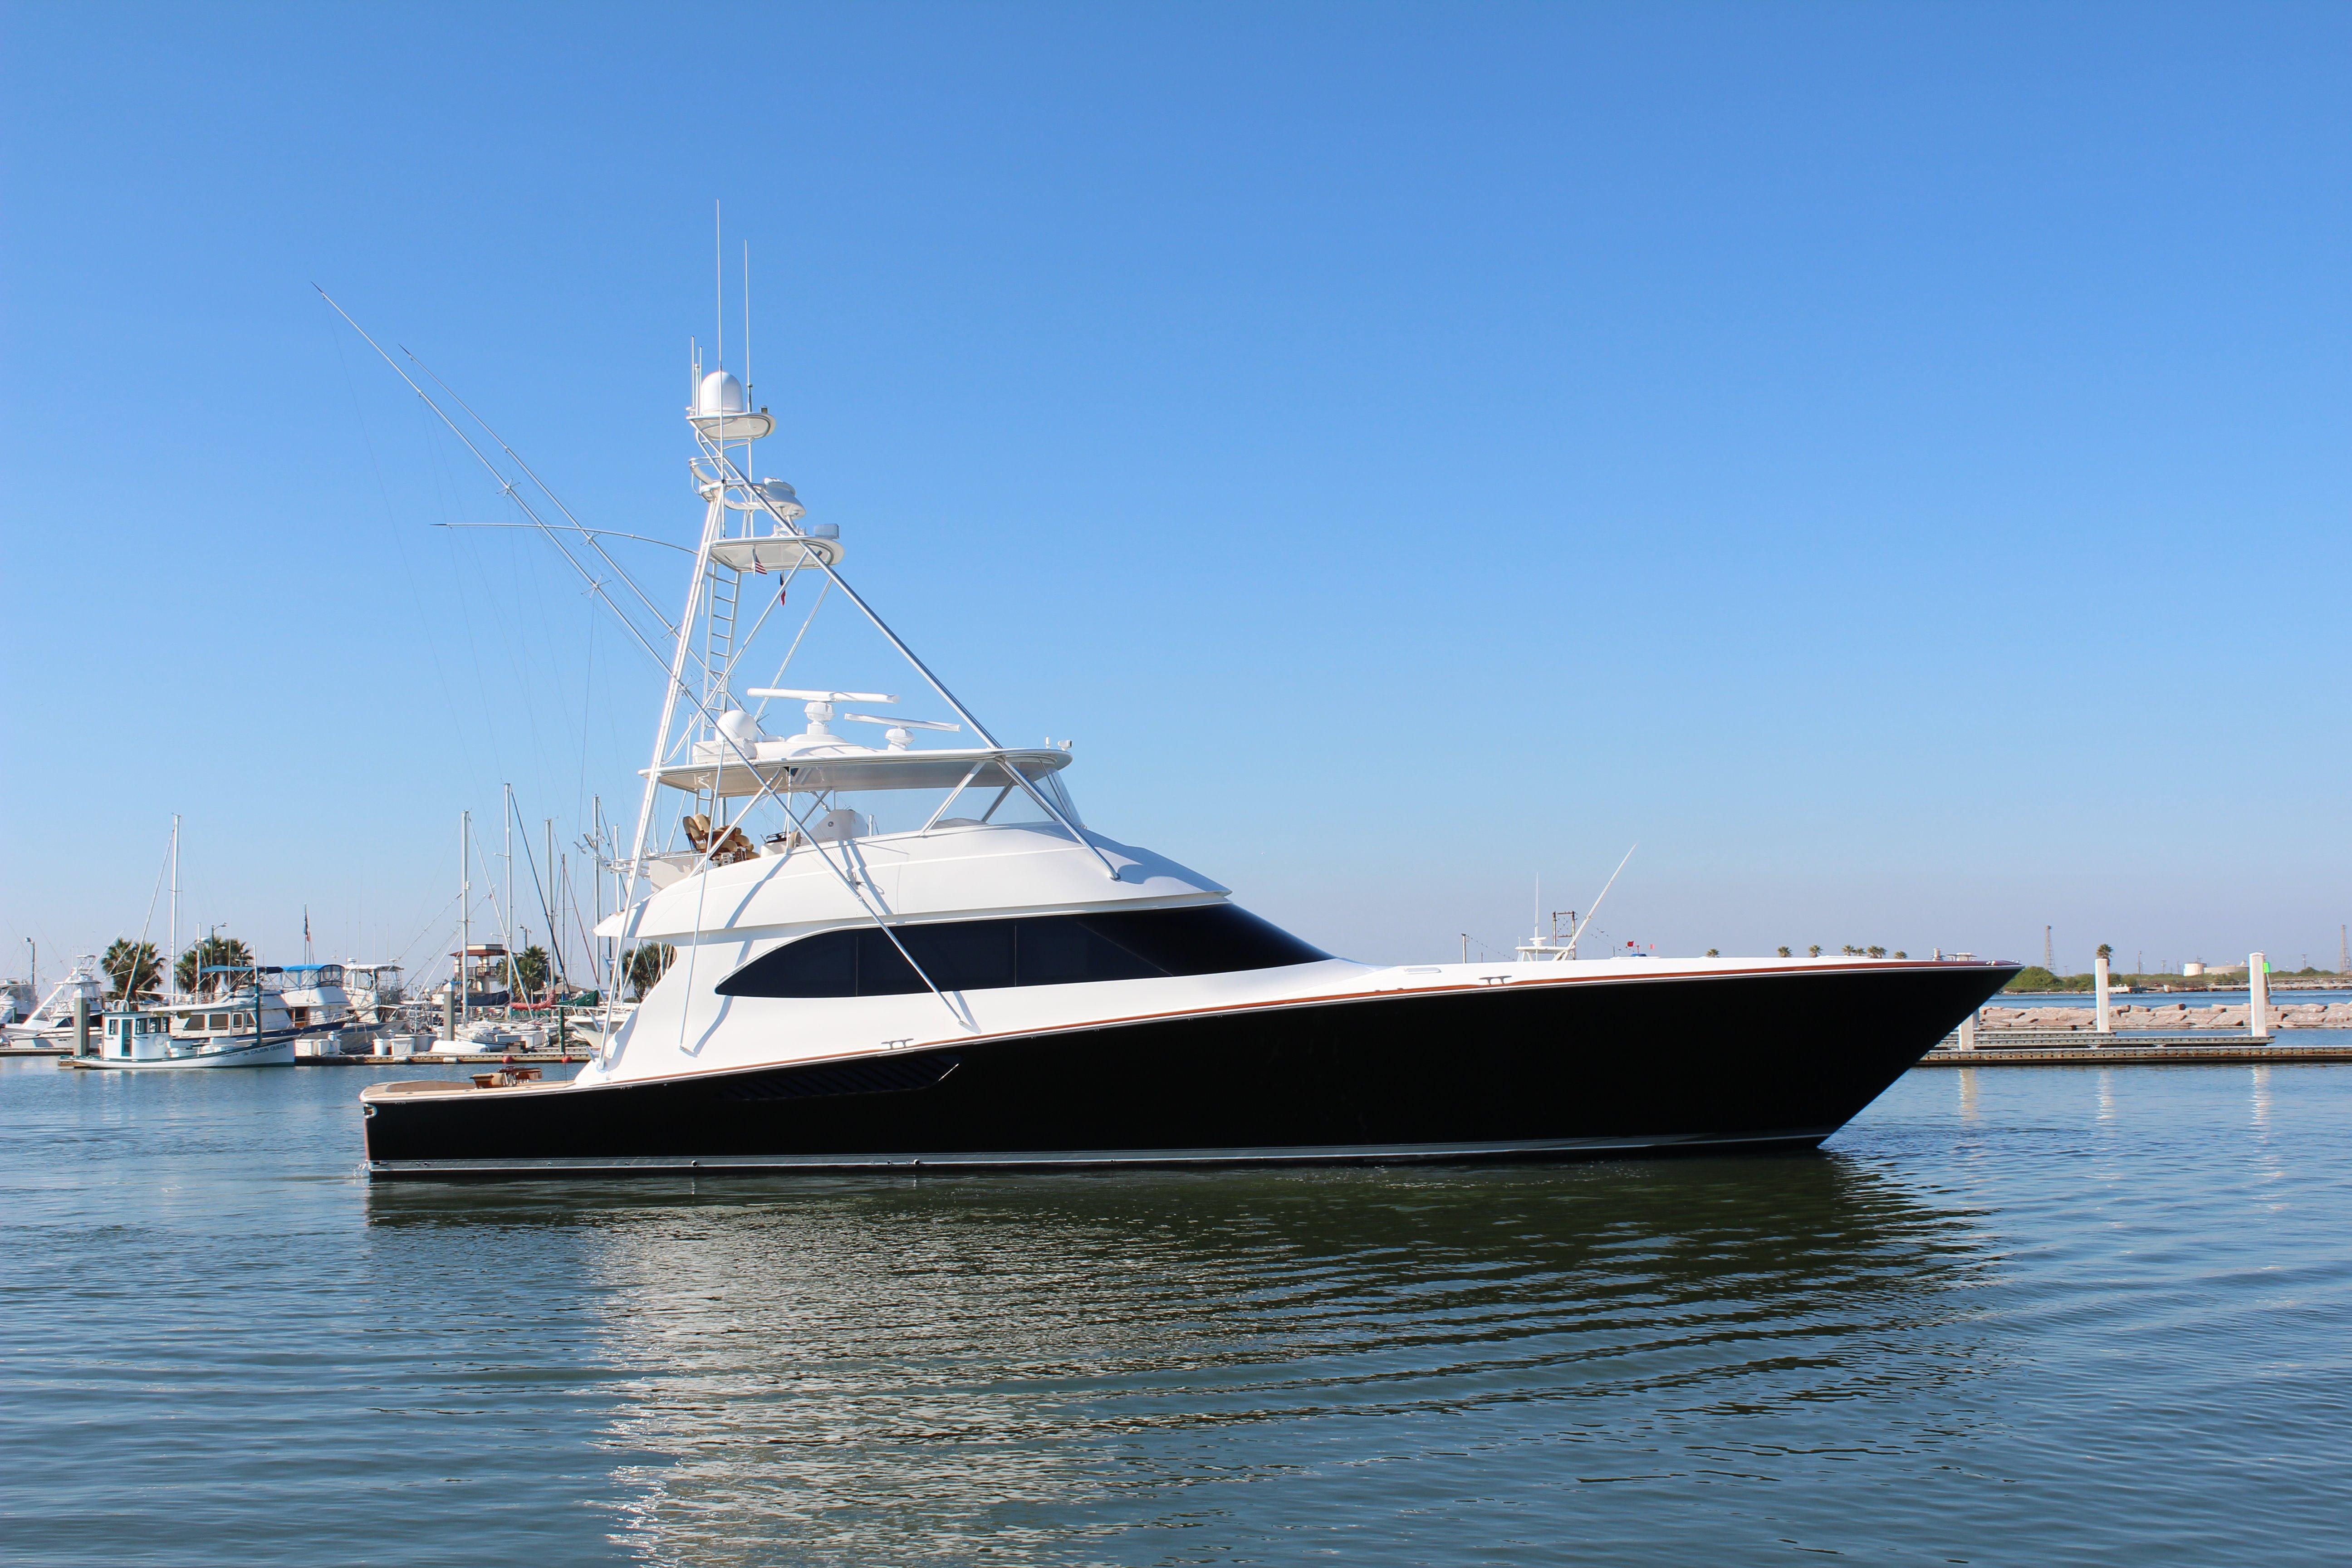 82 viking yachts 2010 bandit for sale in port aransas